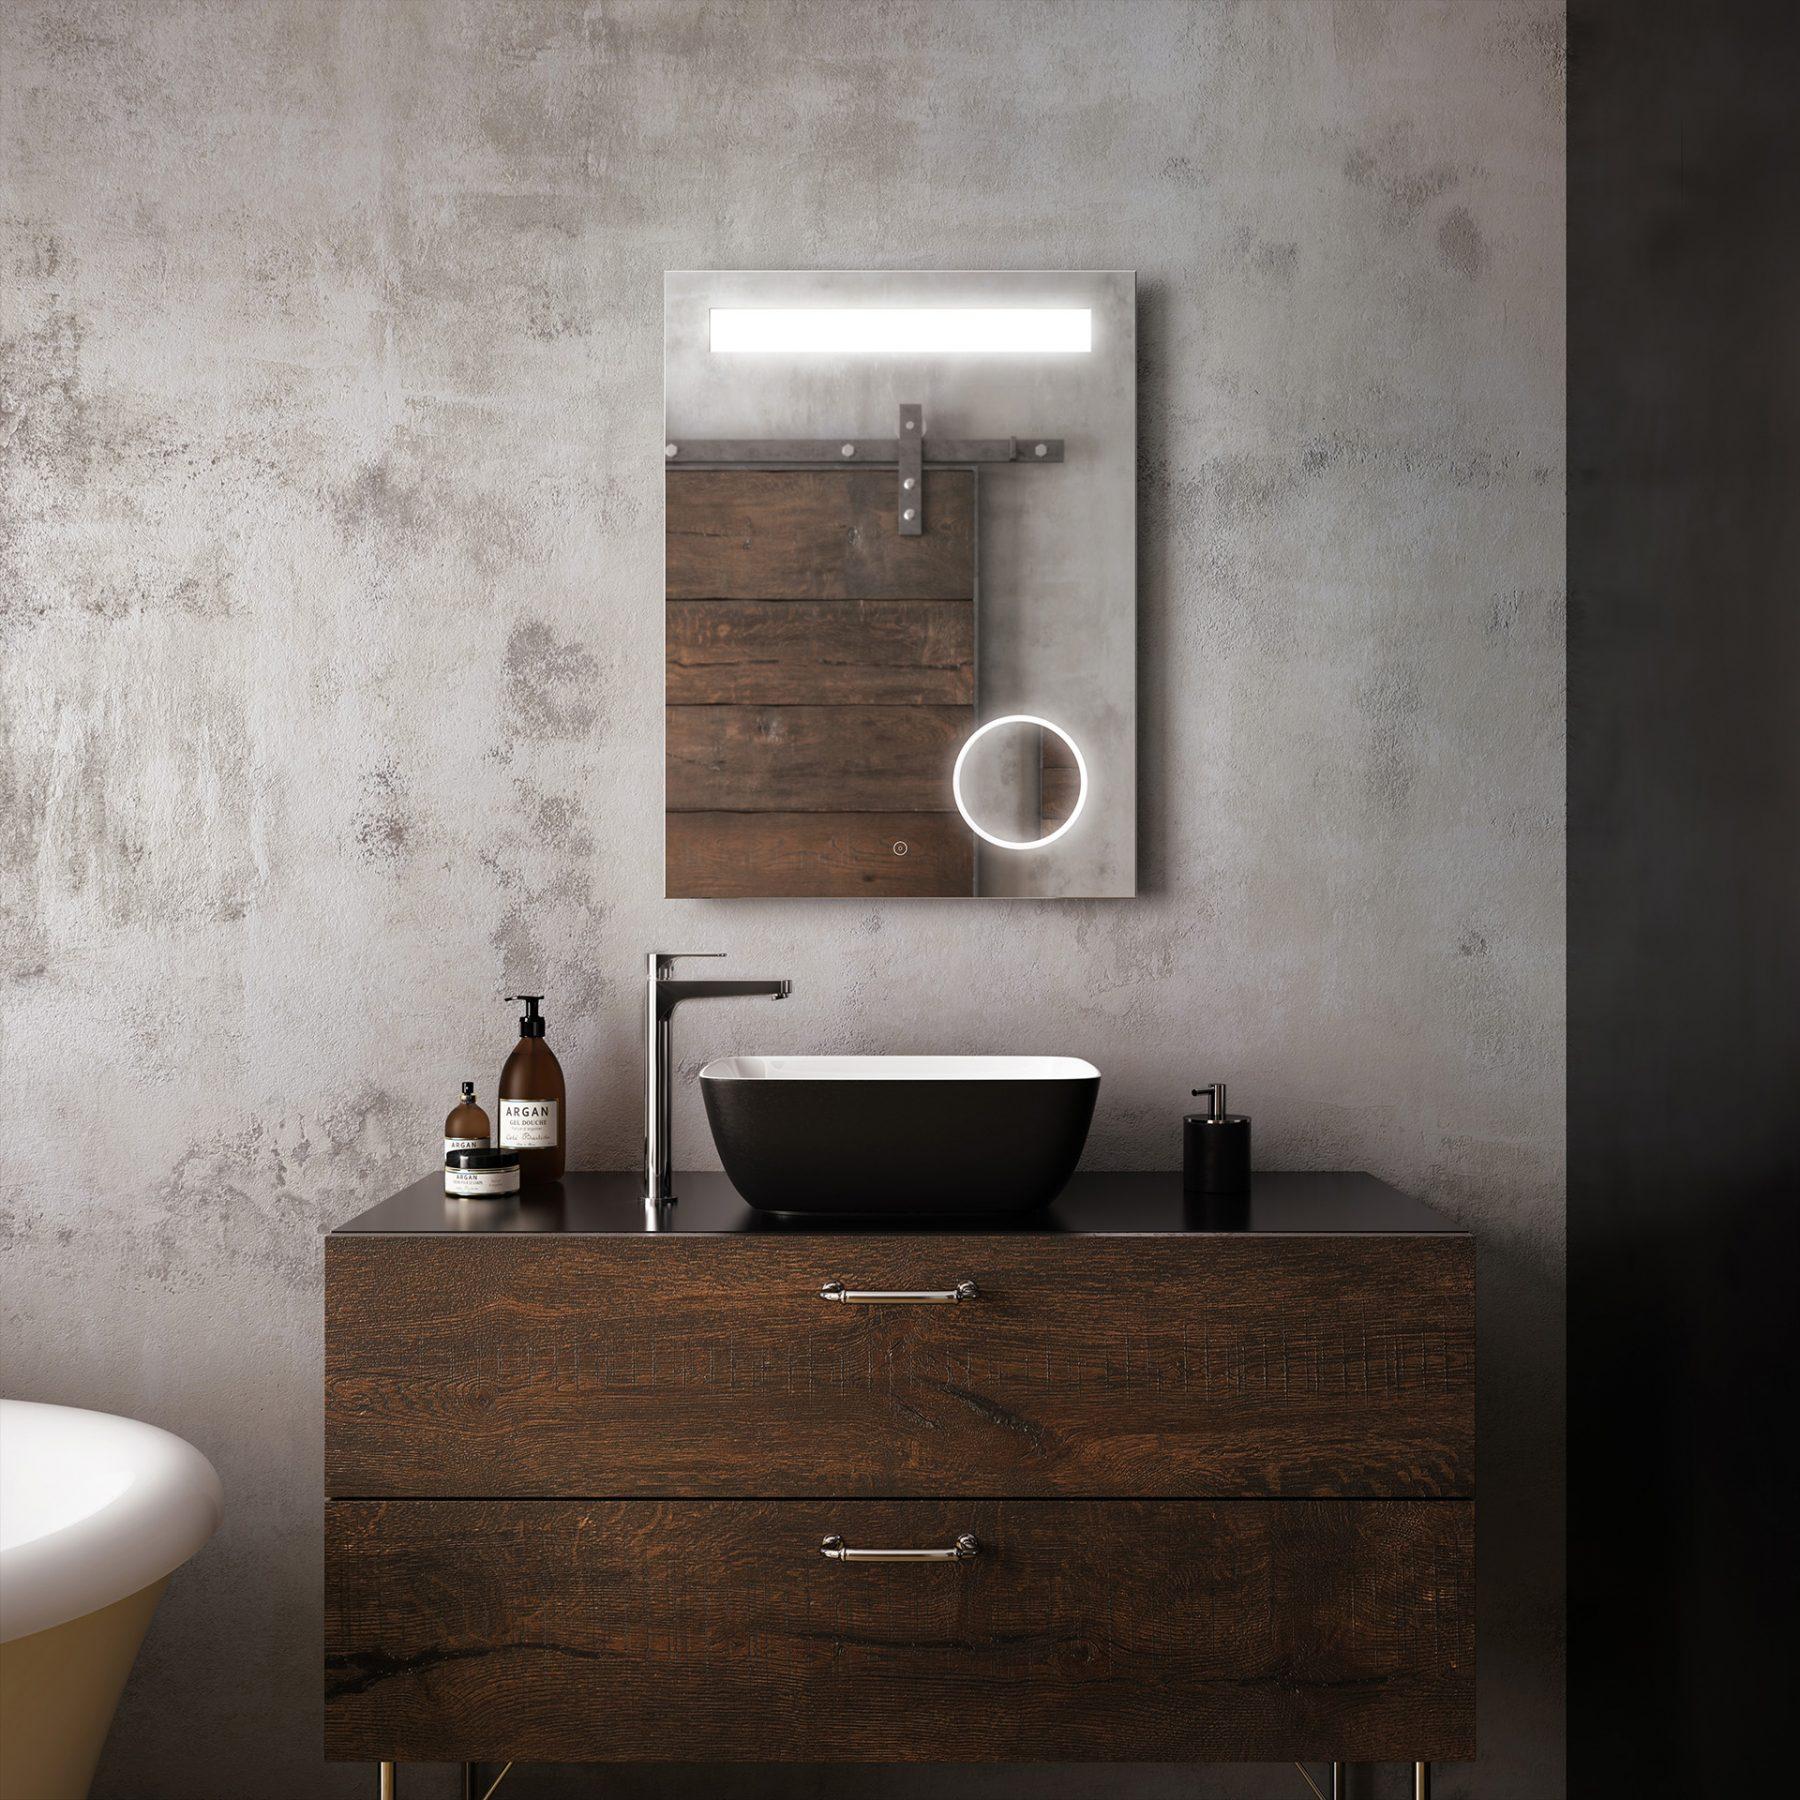 photo-realistic-light-mirror-bathroom